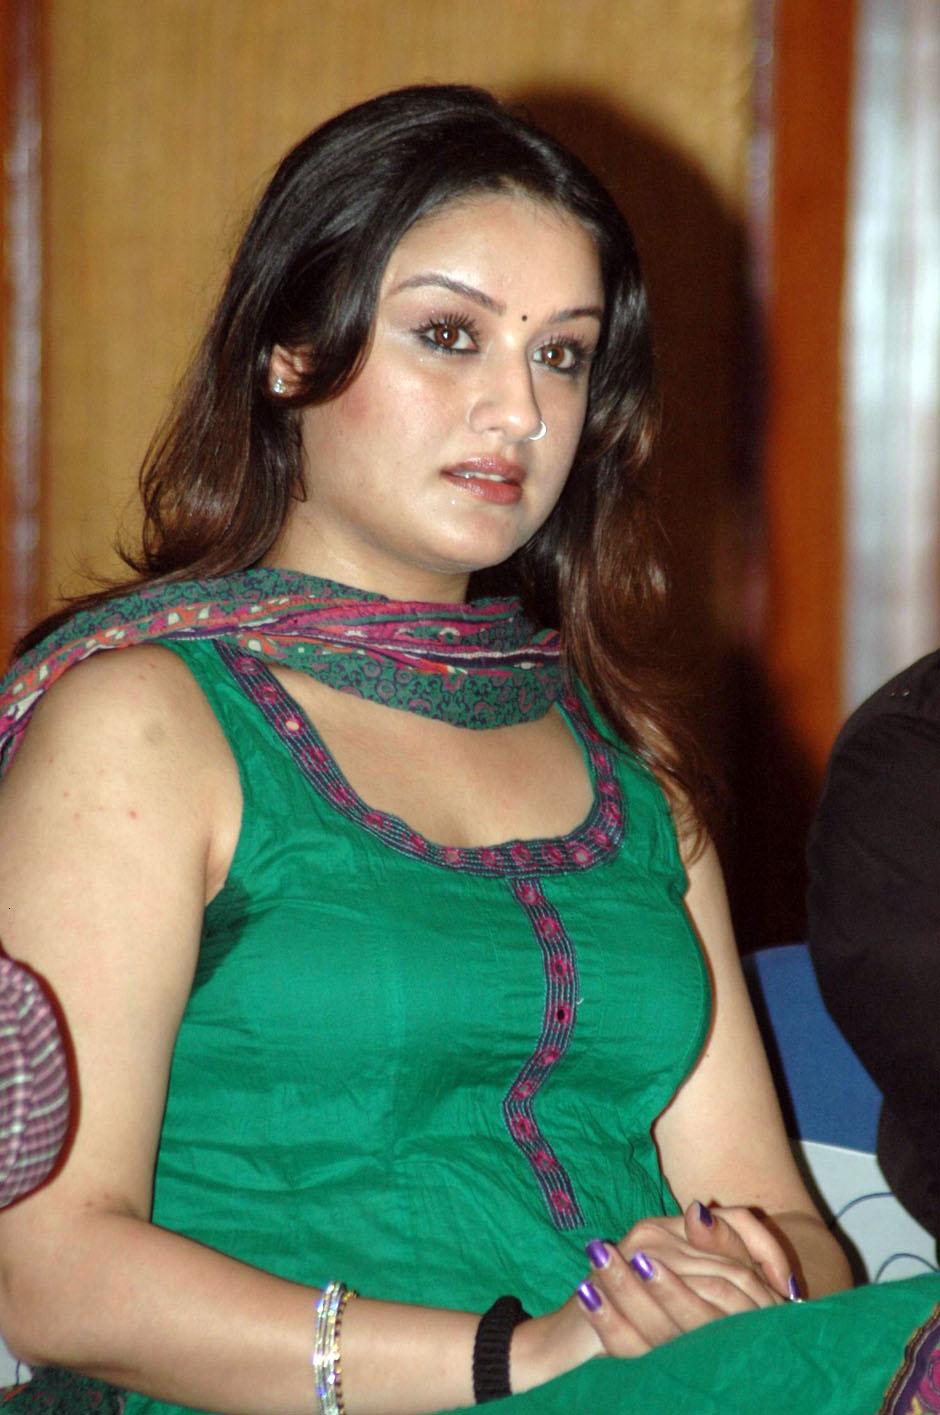 Slicypics Indian Actress Tamanna Bhatia Photos: Kollywood Spicy Actress Sonia Agarwal Latest Green Dress